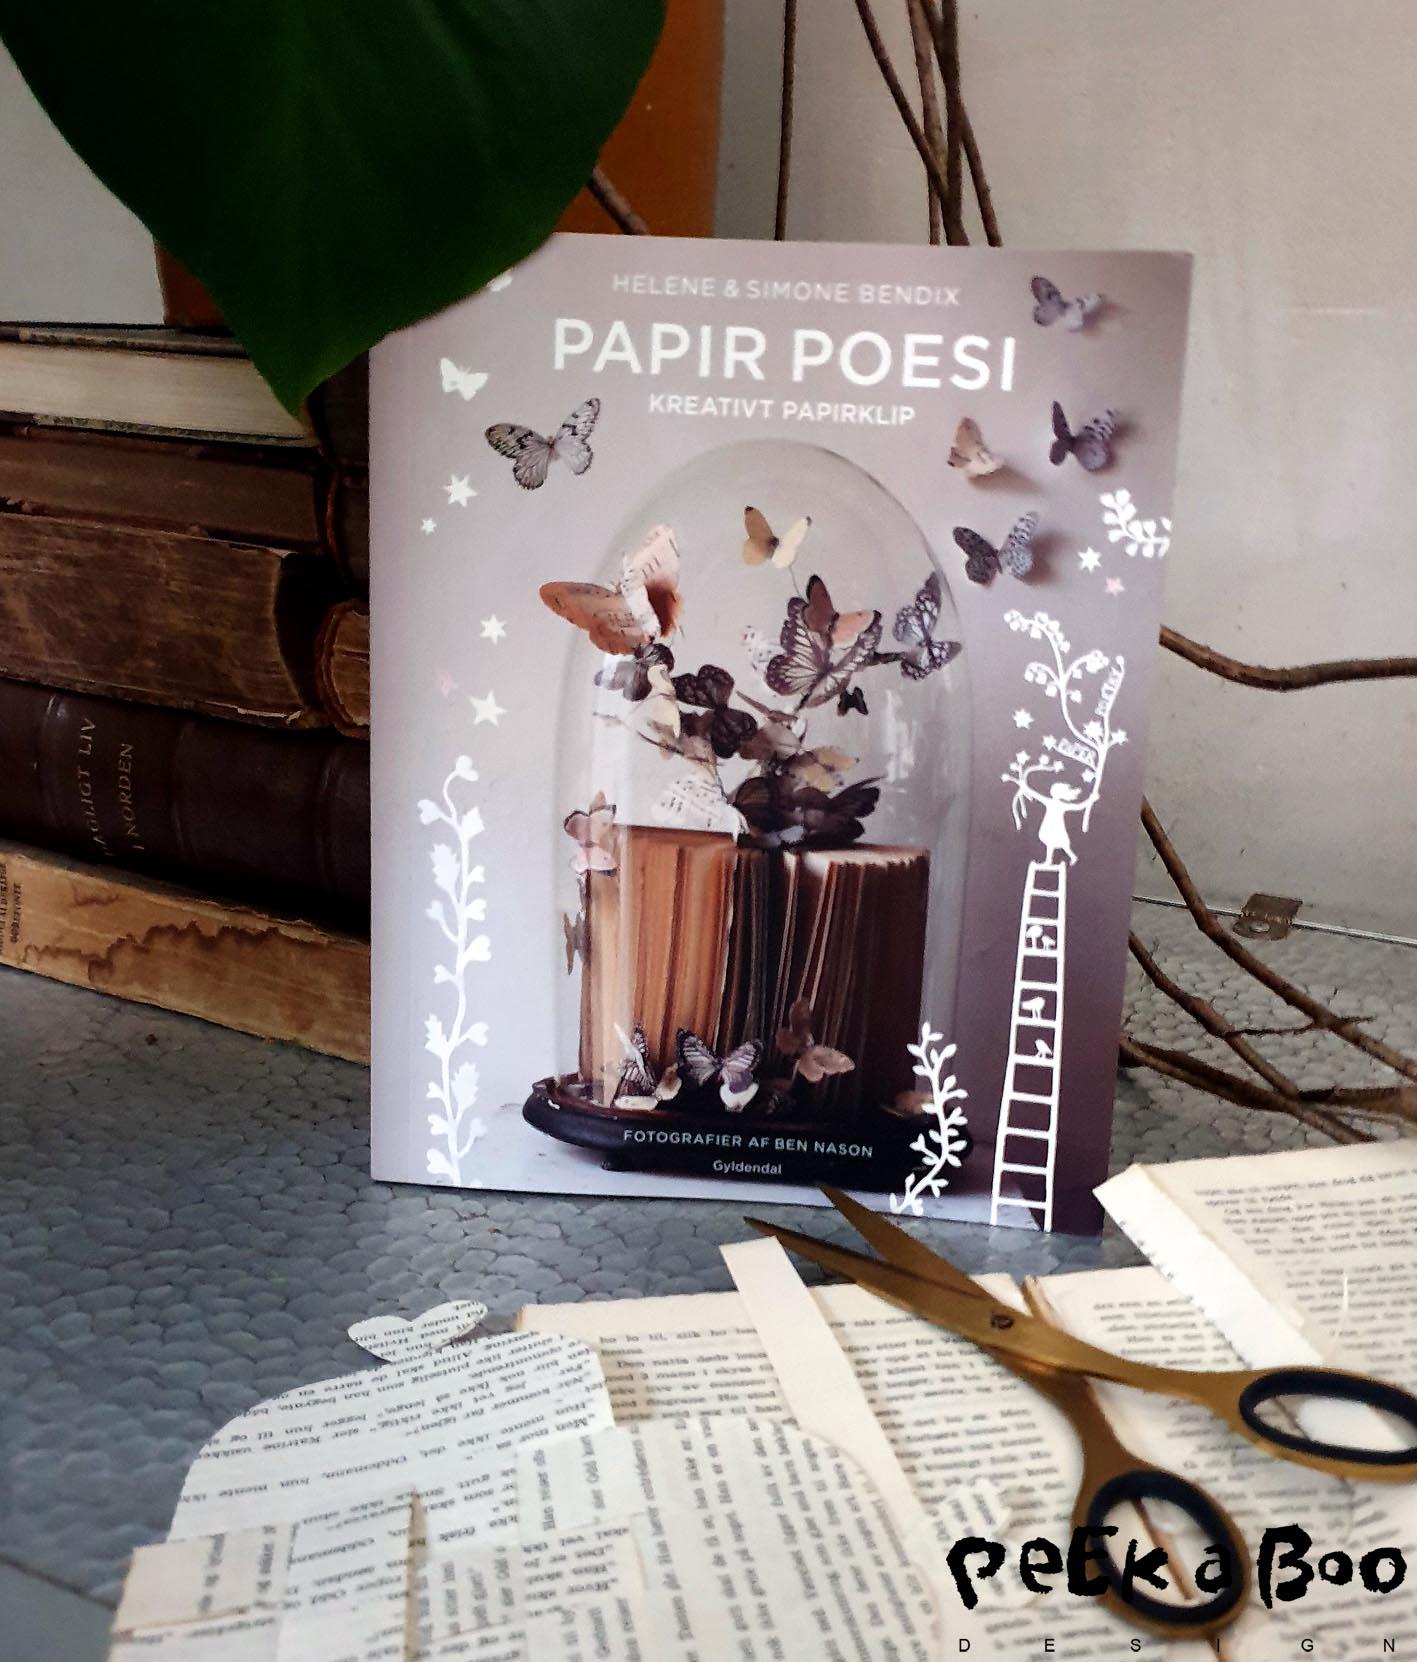 Papir poesi af Helene og Simone Bendix.